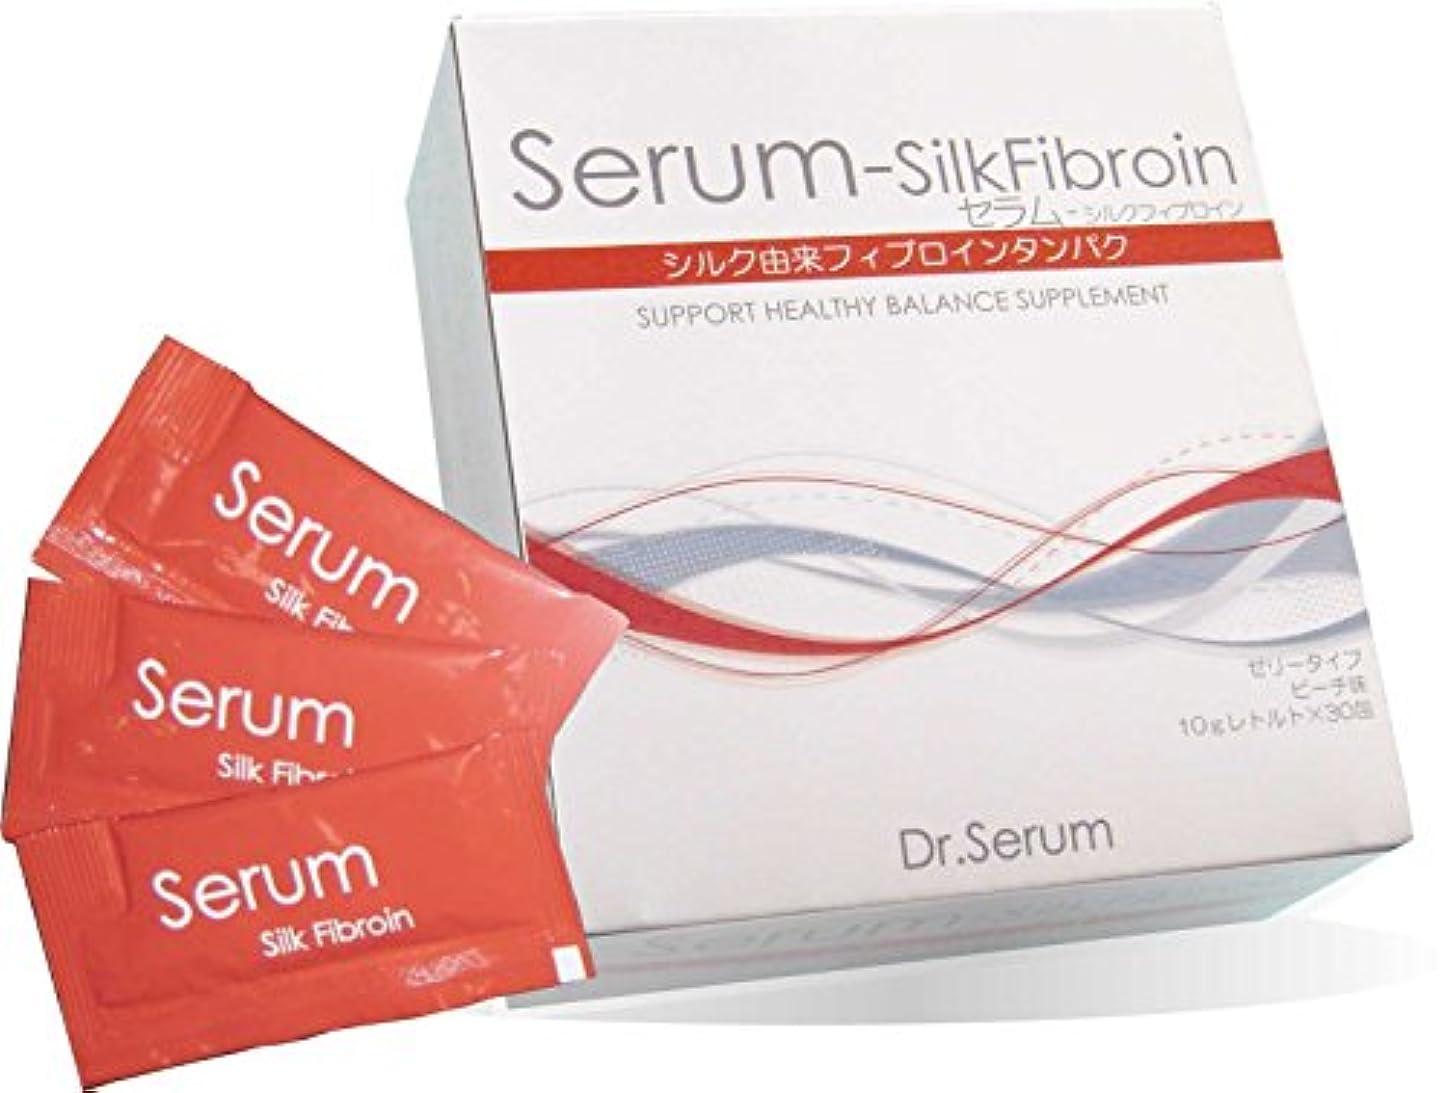 【Silk Fibroin】セラム-シルクフィブロイン 10g×30包×3箱セット 特許取得の食べるシルクダイエット